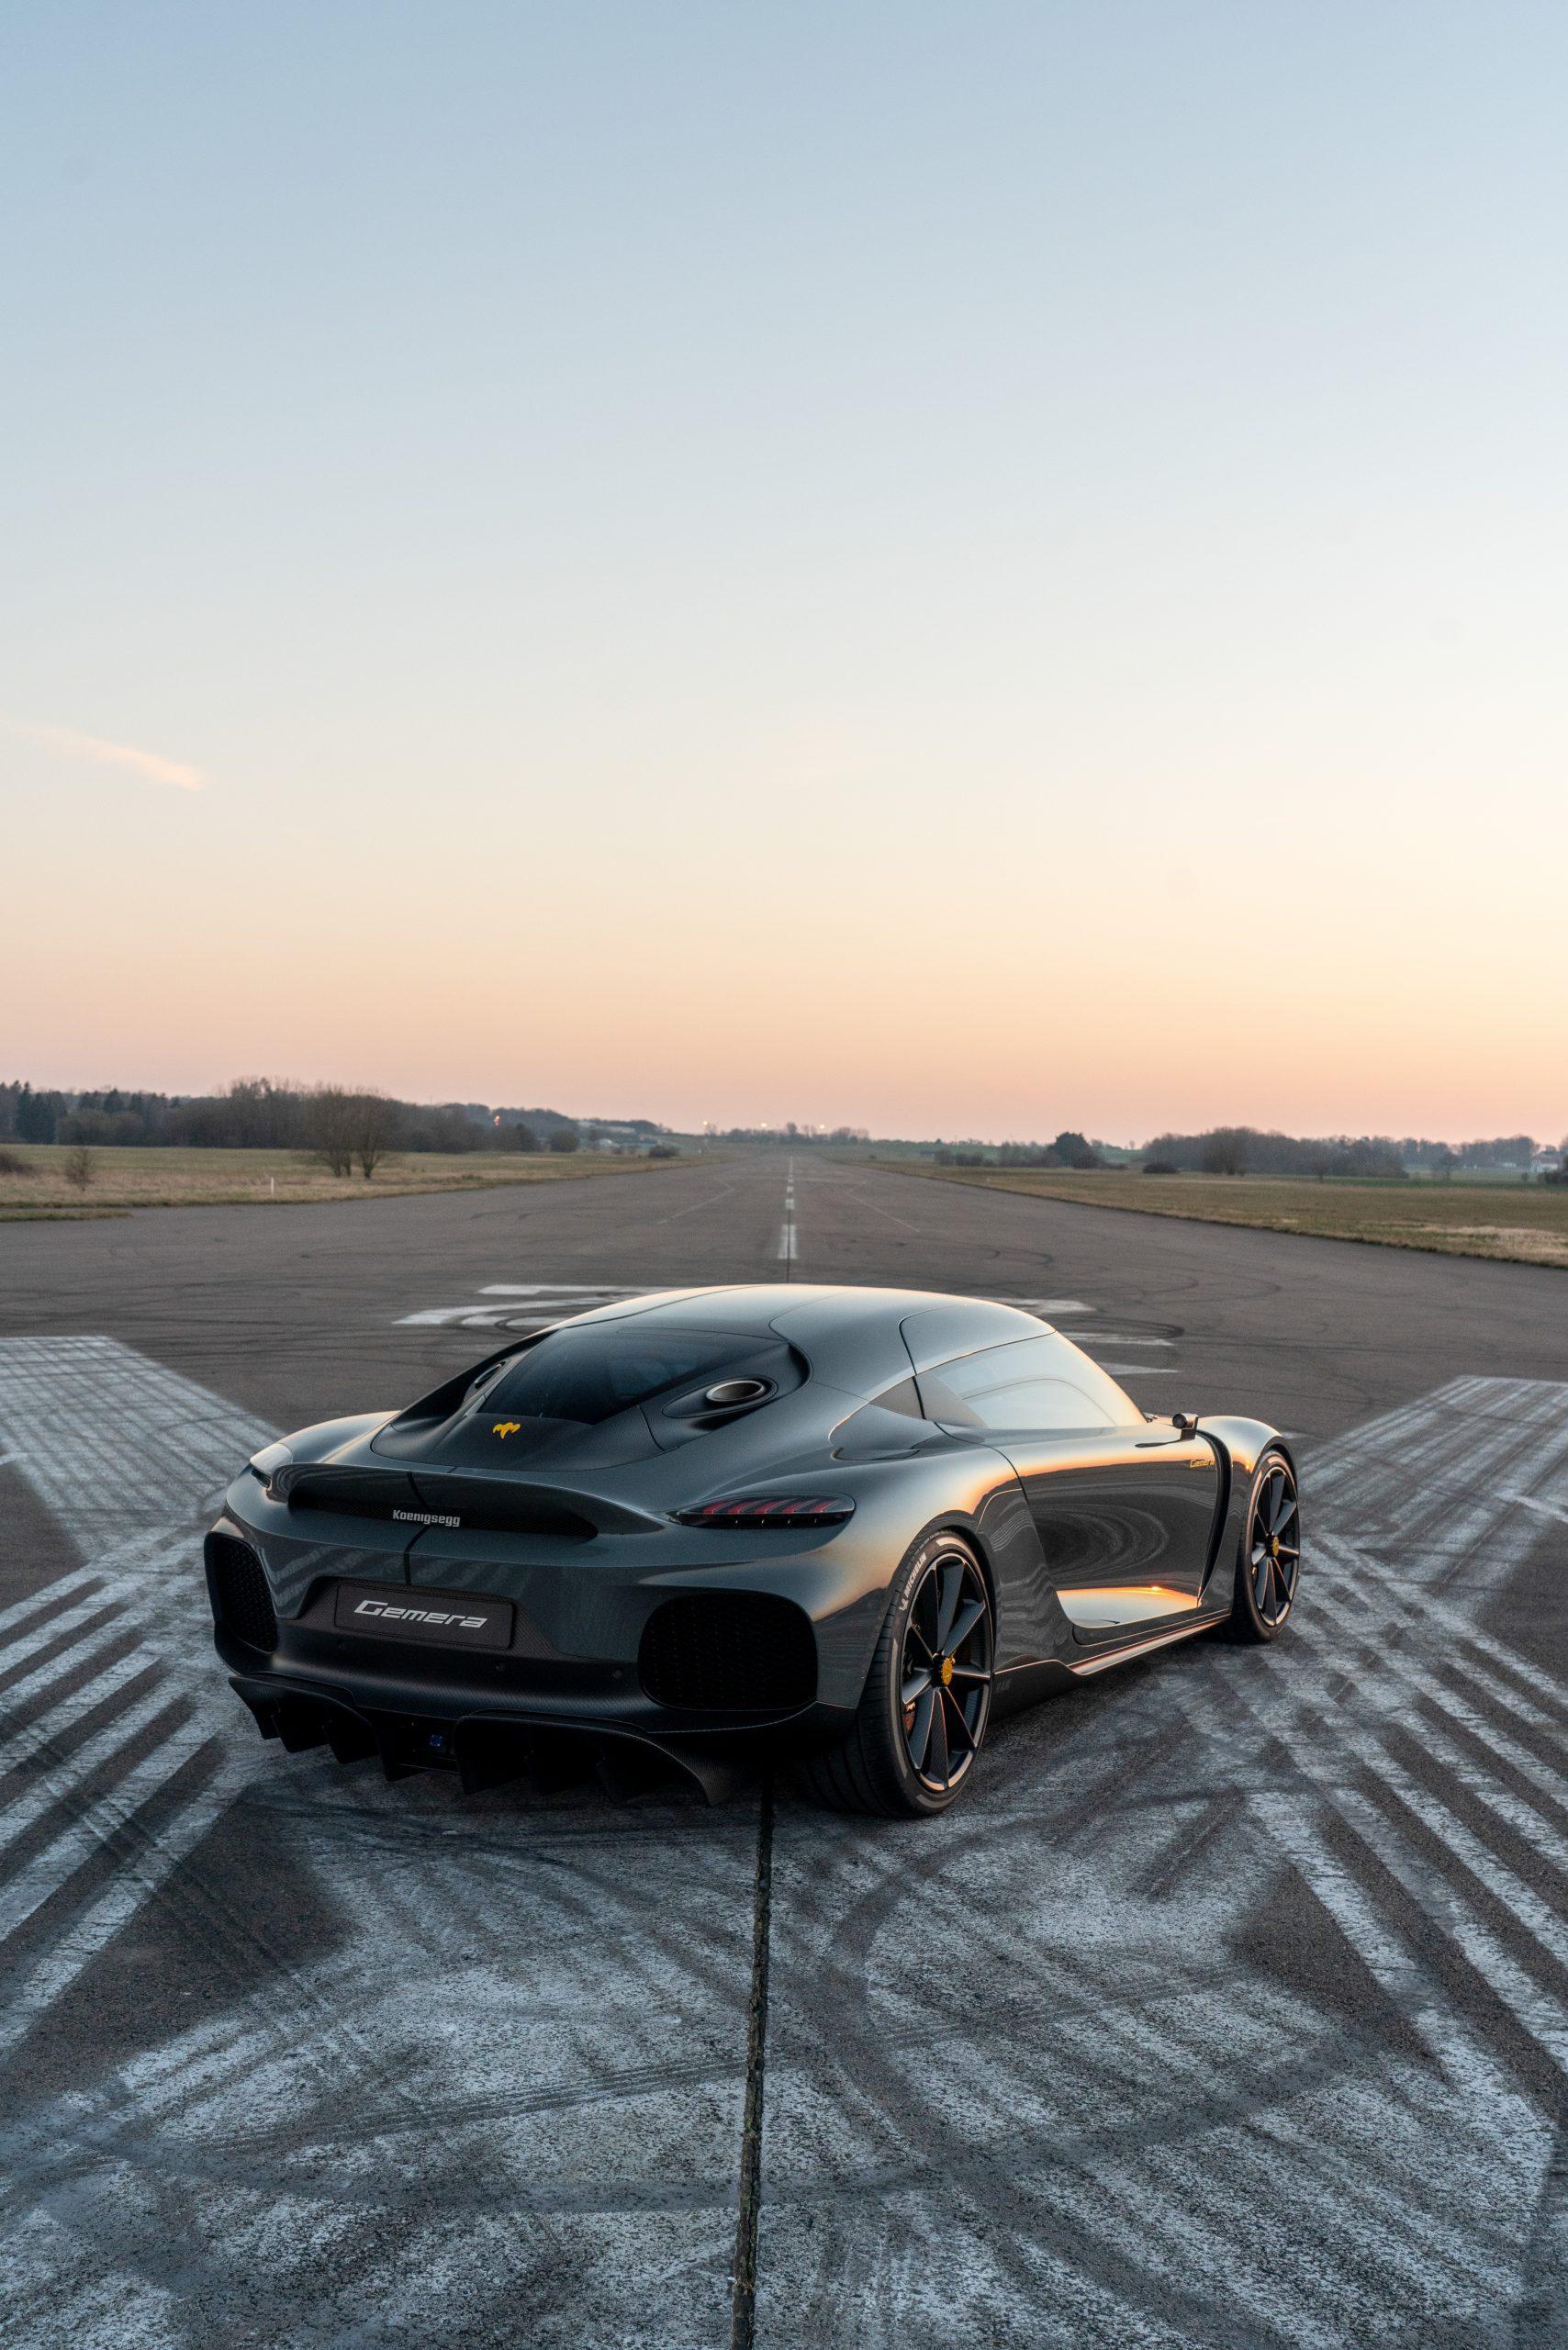 Koenigsegg Gemera rear spoiler